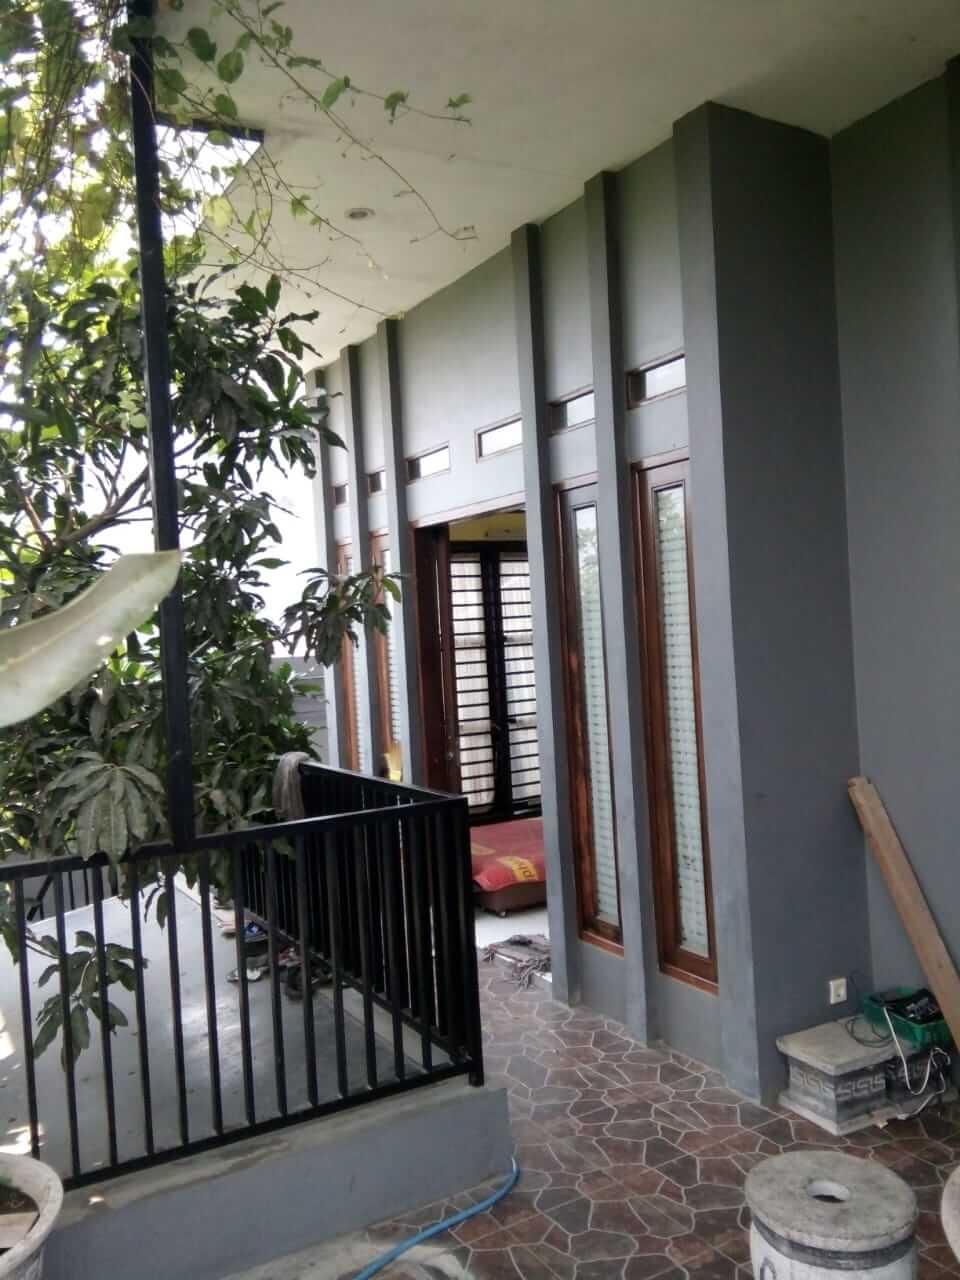 Jual Rumah Minimalis Griya Candramas Sedati Sidoarjo - BeliSewaRumah - Tampak Luar